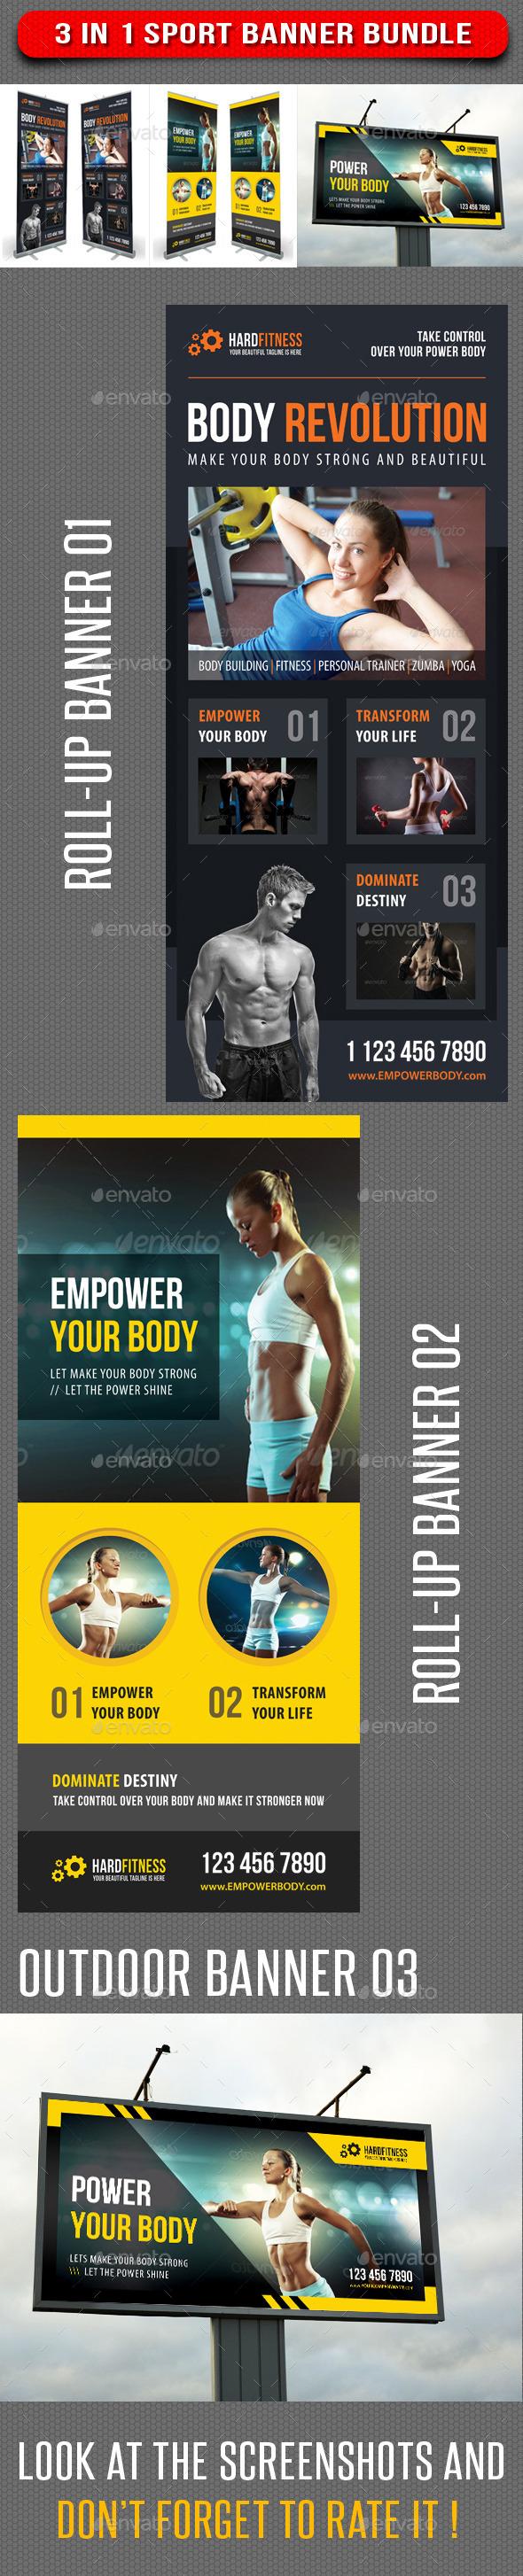 GraphicRiver 3 in 1 Sport Banner Bundle 05 8888590